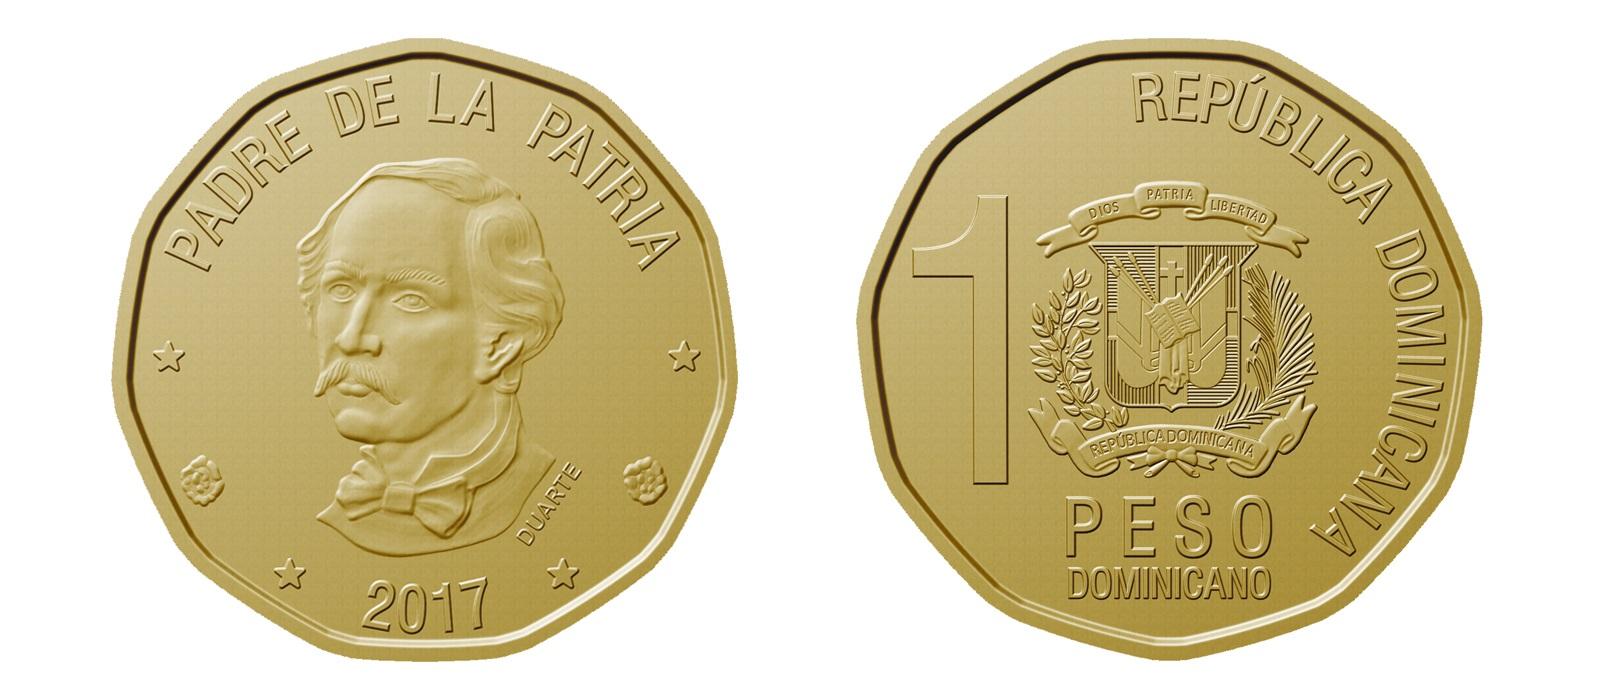 nuevamonedard$1.00